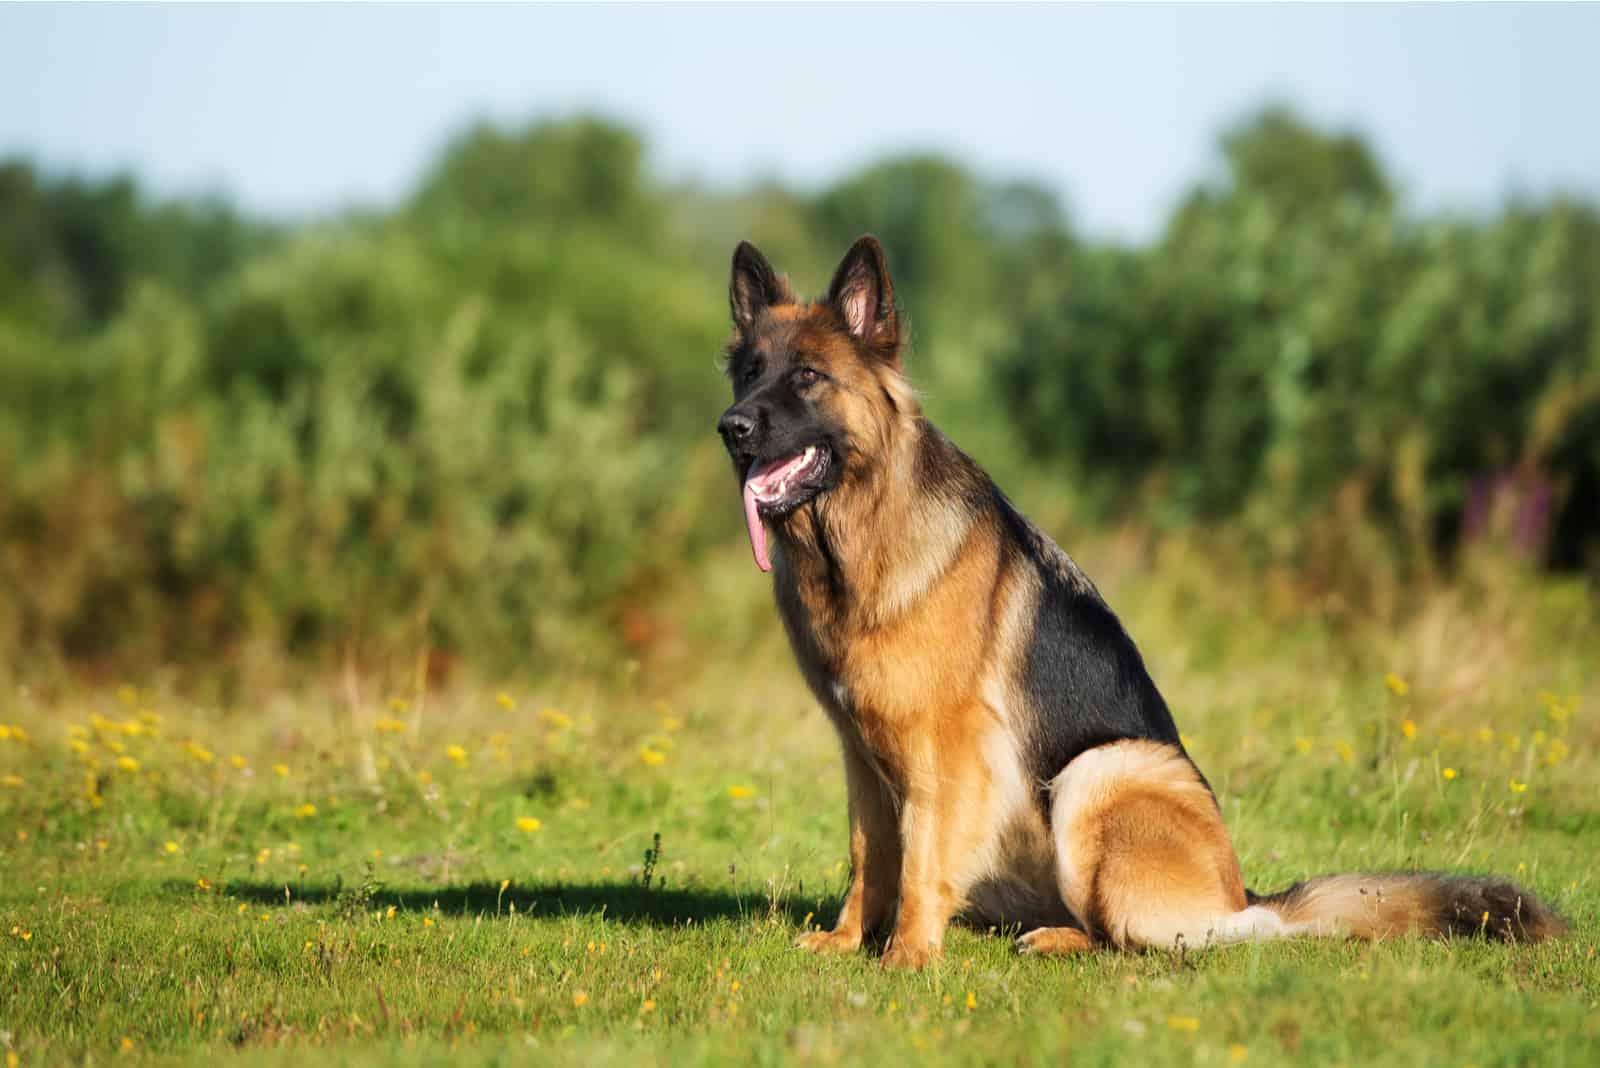 german shepherd dog sitting outdoors